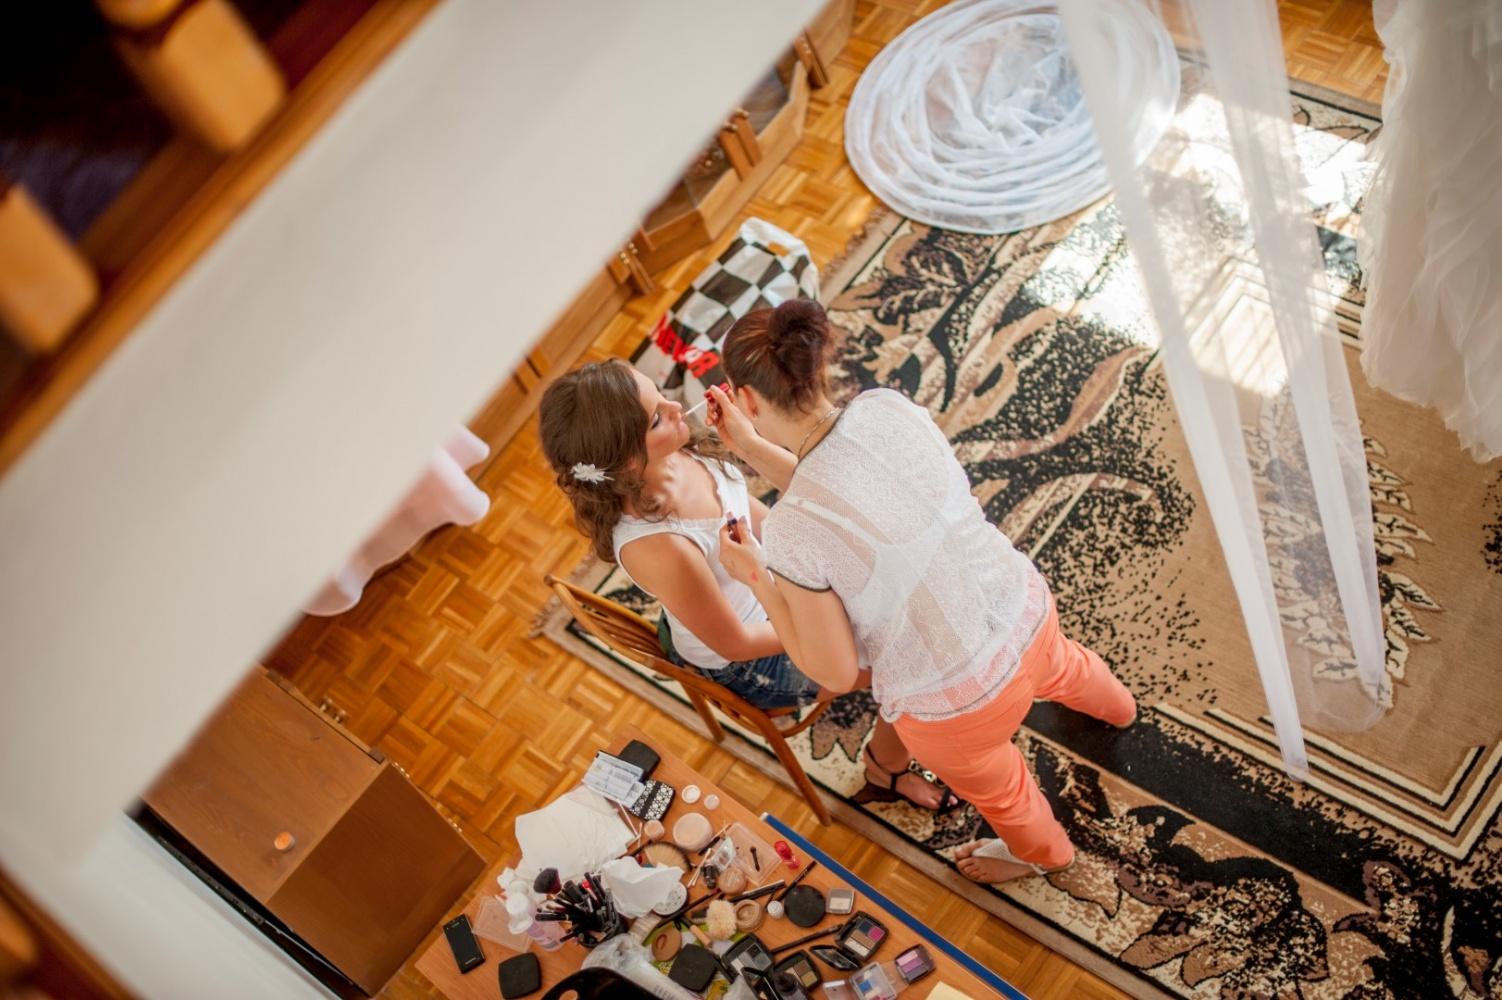 http://www.fotoz.sk/images/gallery-21/normal/svadobne-fotenie_eskuvoi-fotos_058.jpg